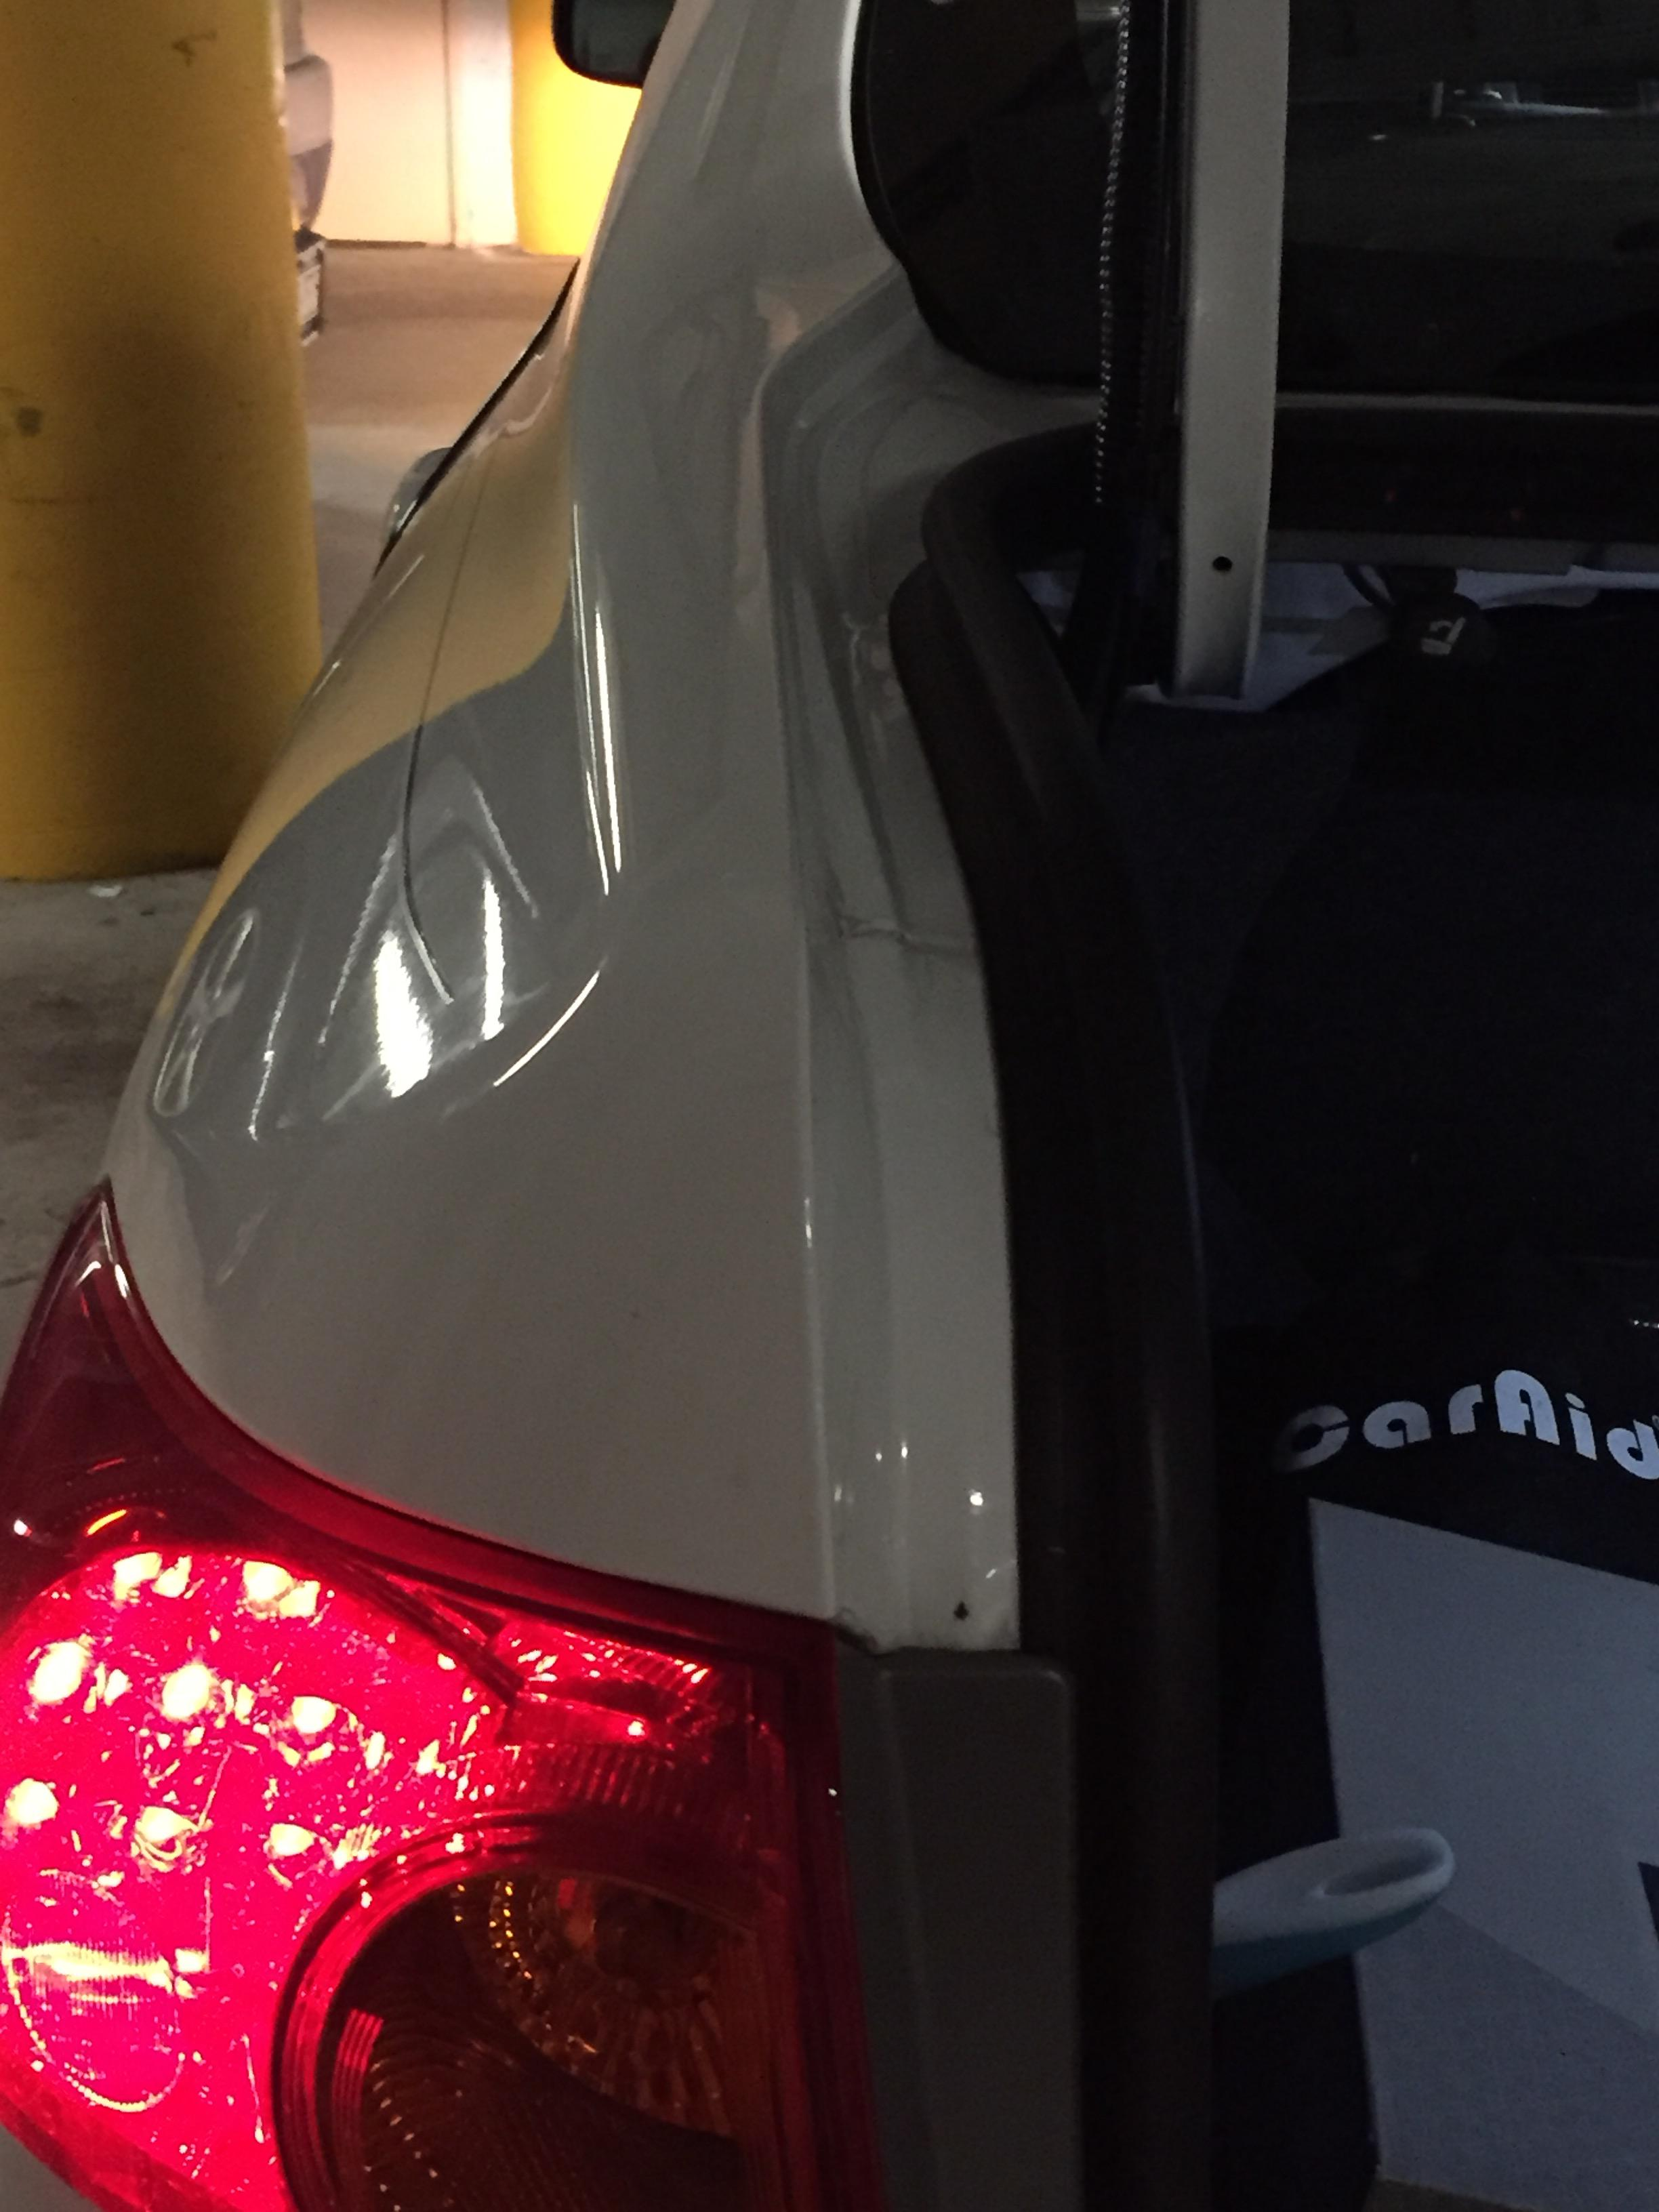 New Rear Trunk Lid Weatherstrip Rubber Seal Gasket For Toyota Corolla 2009-2013